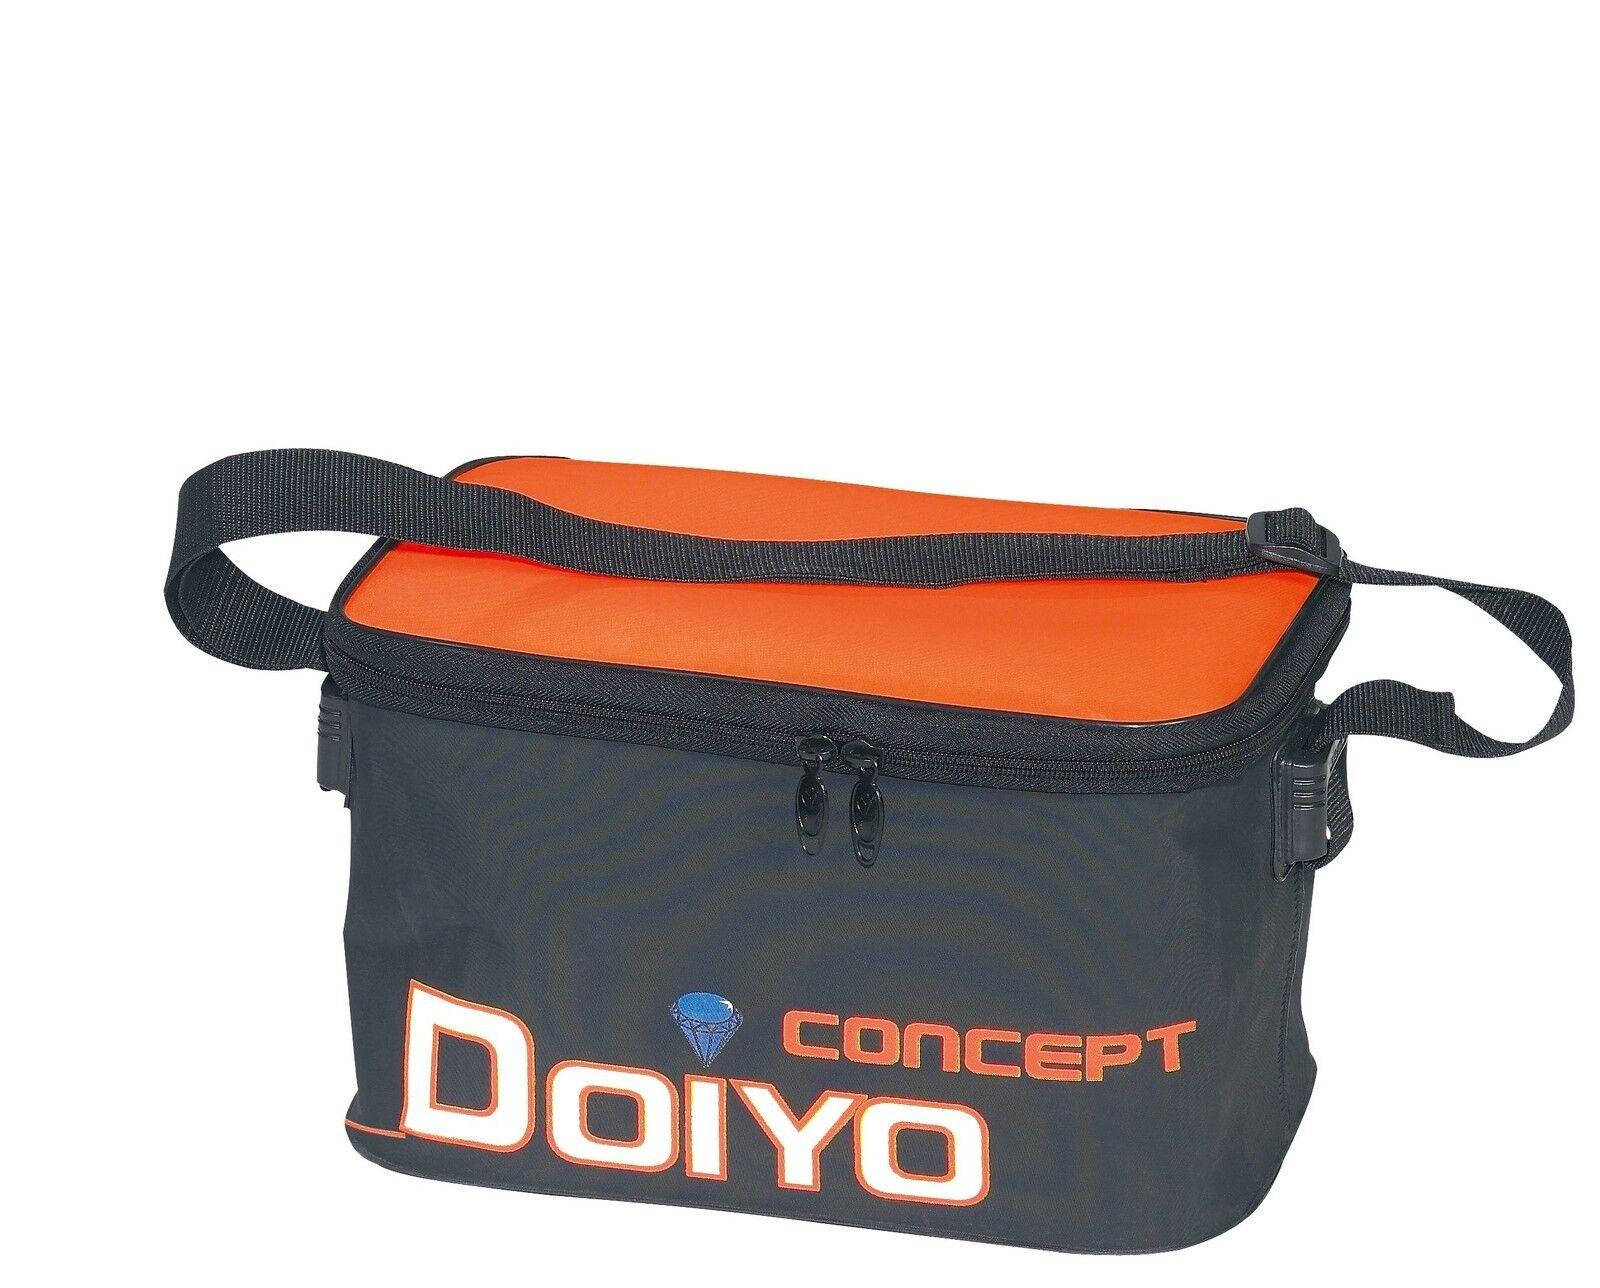 IRON CLAW DOIYO  Bosui III  -  DOIYO CONCEPT - von Sänger